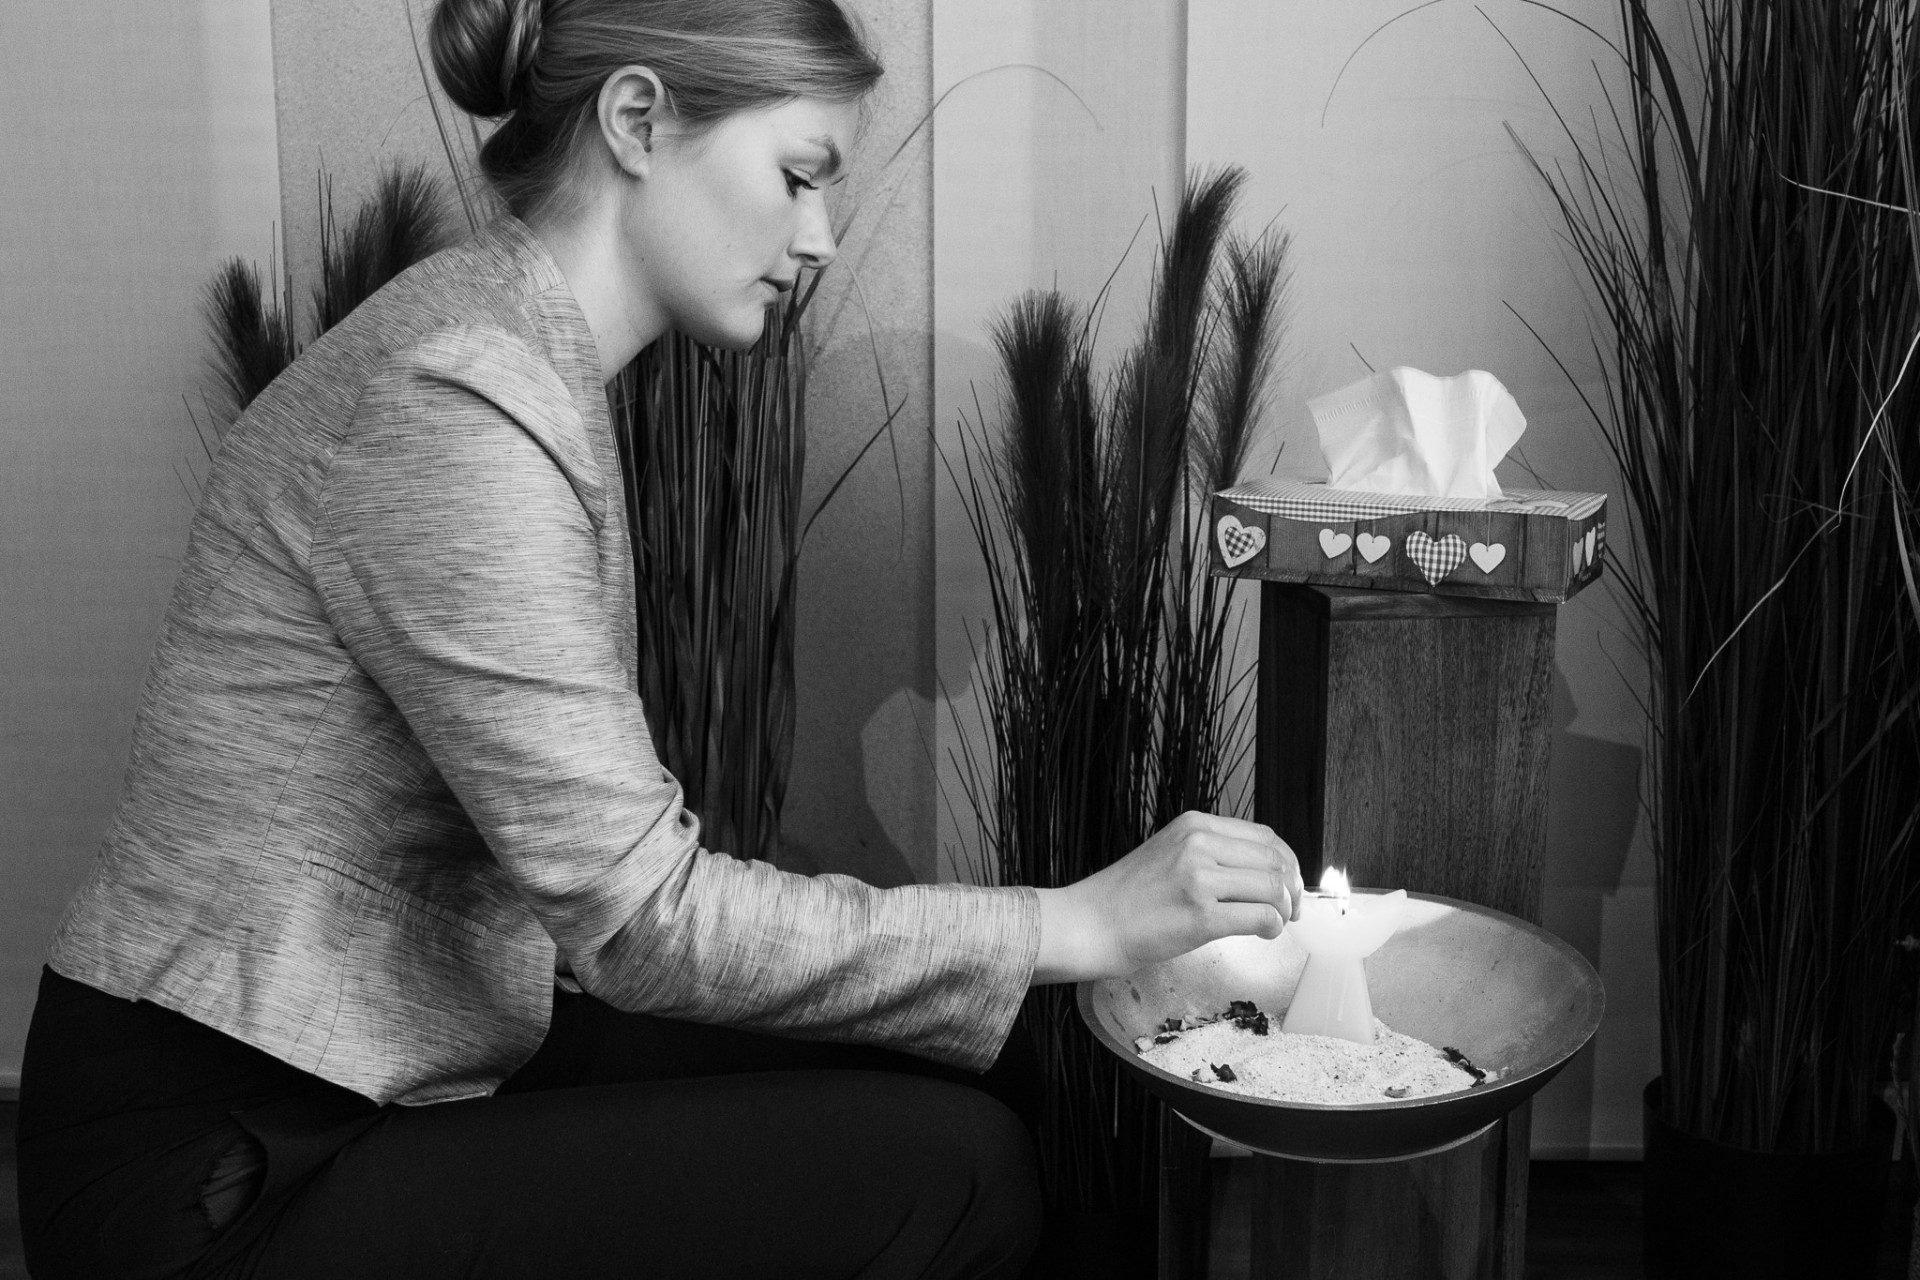 Johanna zündet eine Kerze an